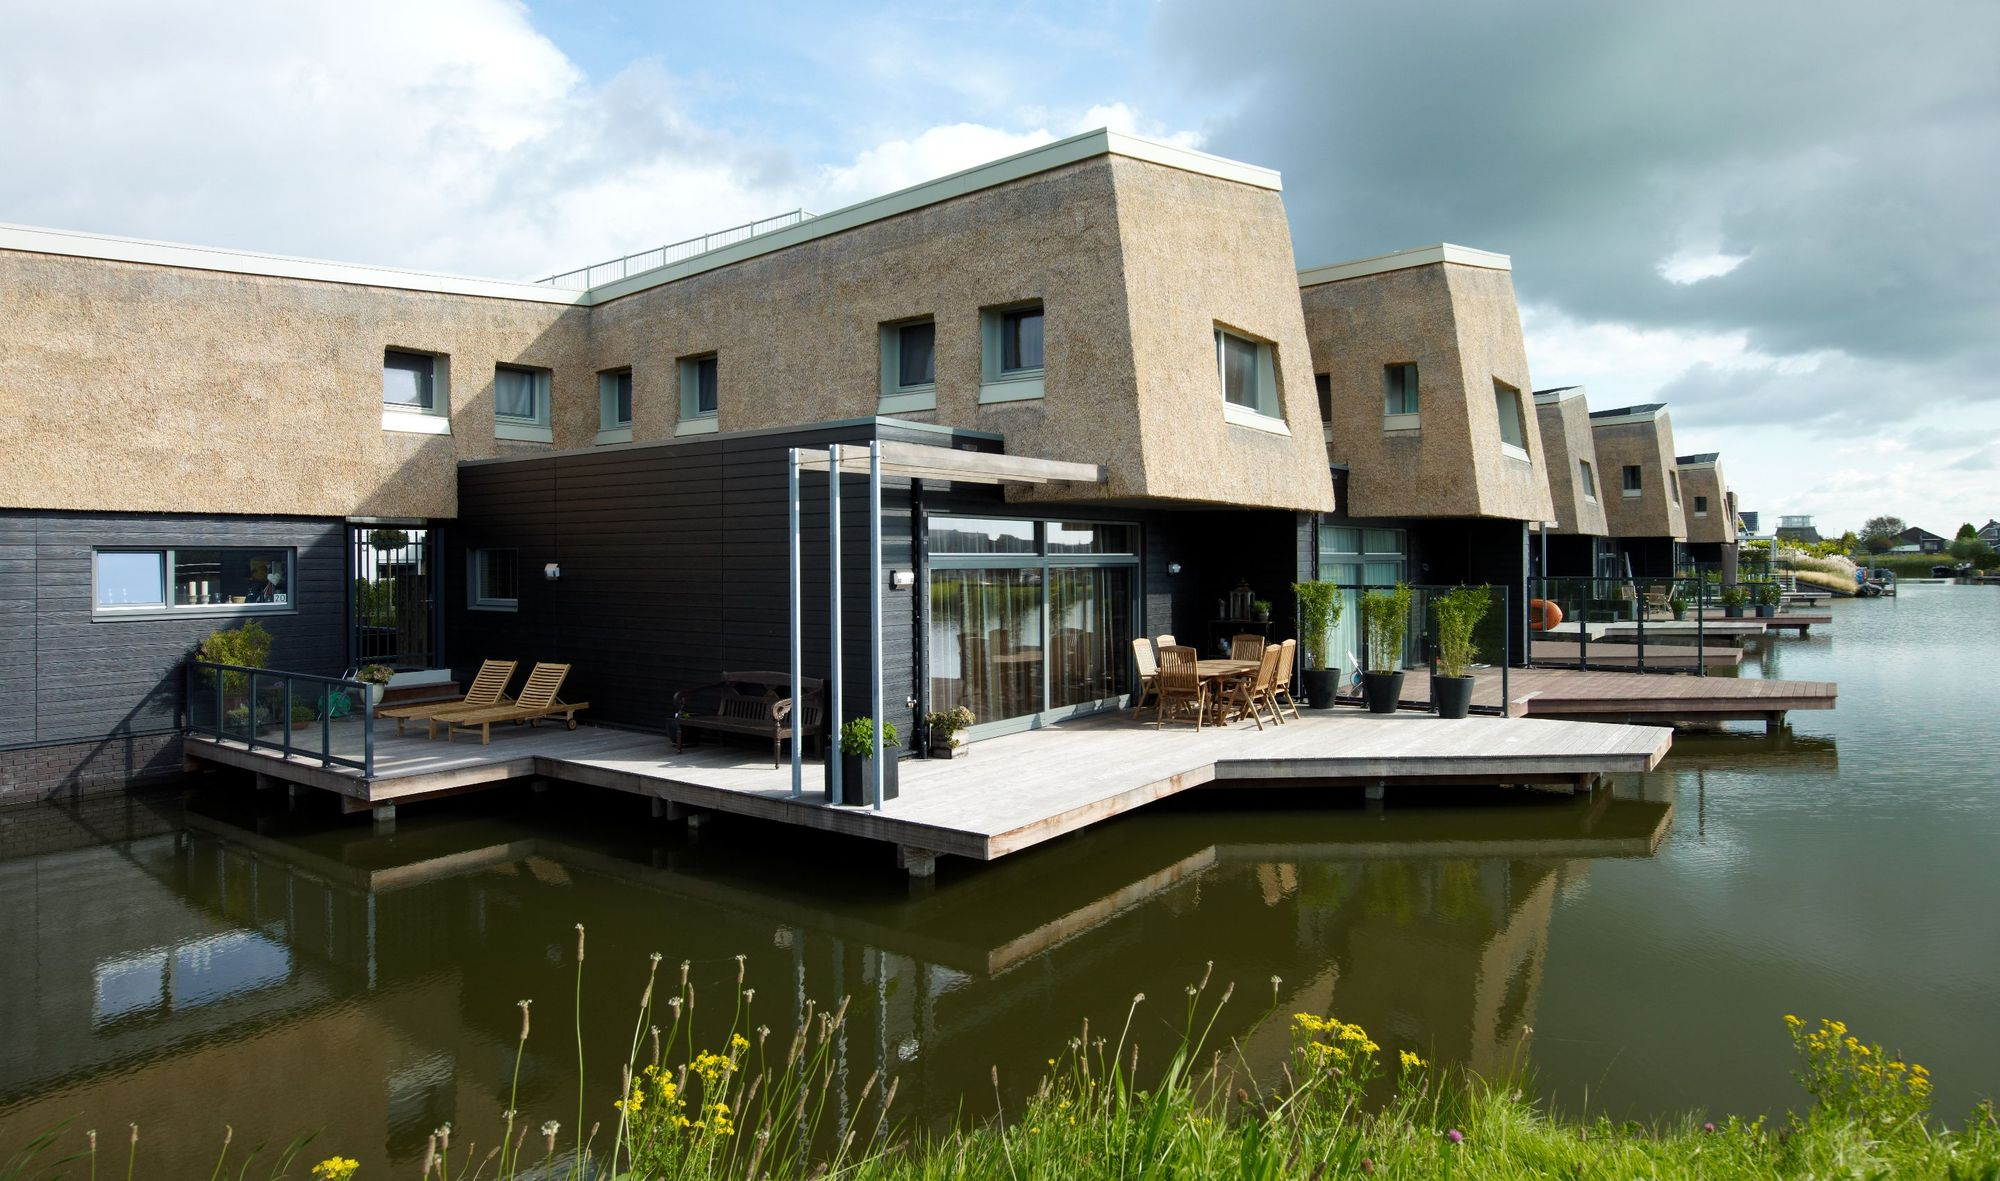 Functional-9-Houses-on-the-Water-by-BLAUW-architecten-+-FARO-Architecten-3